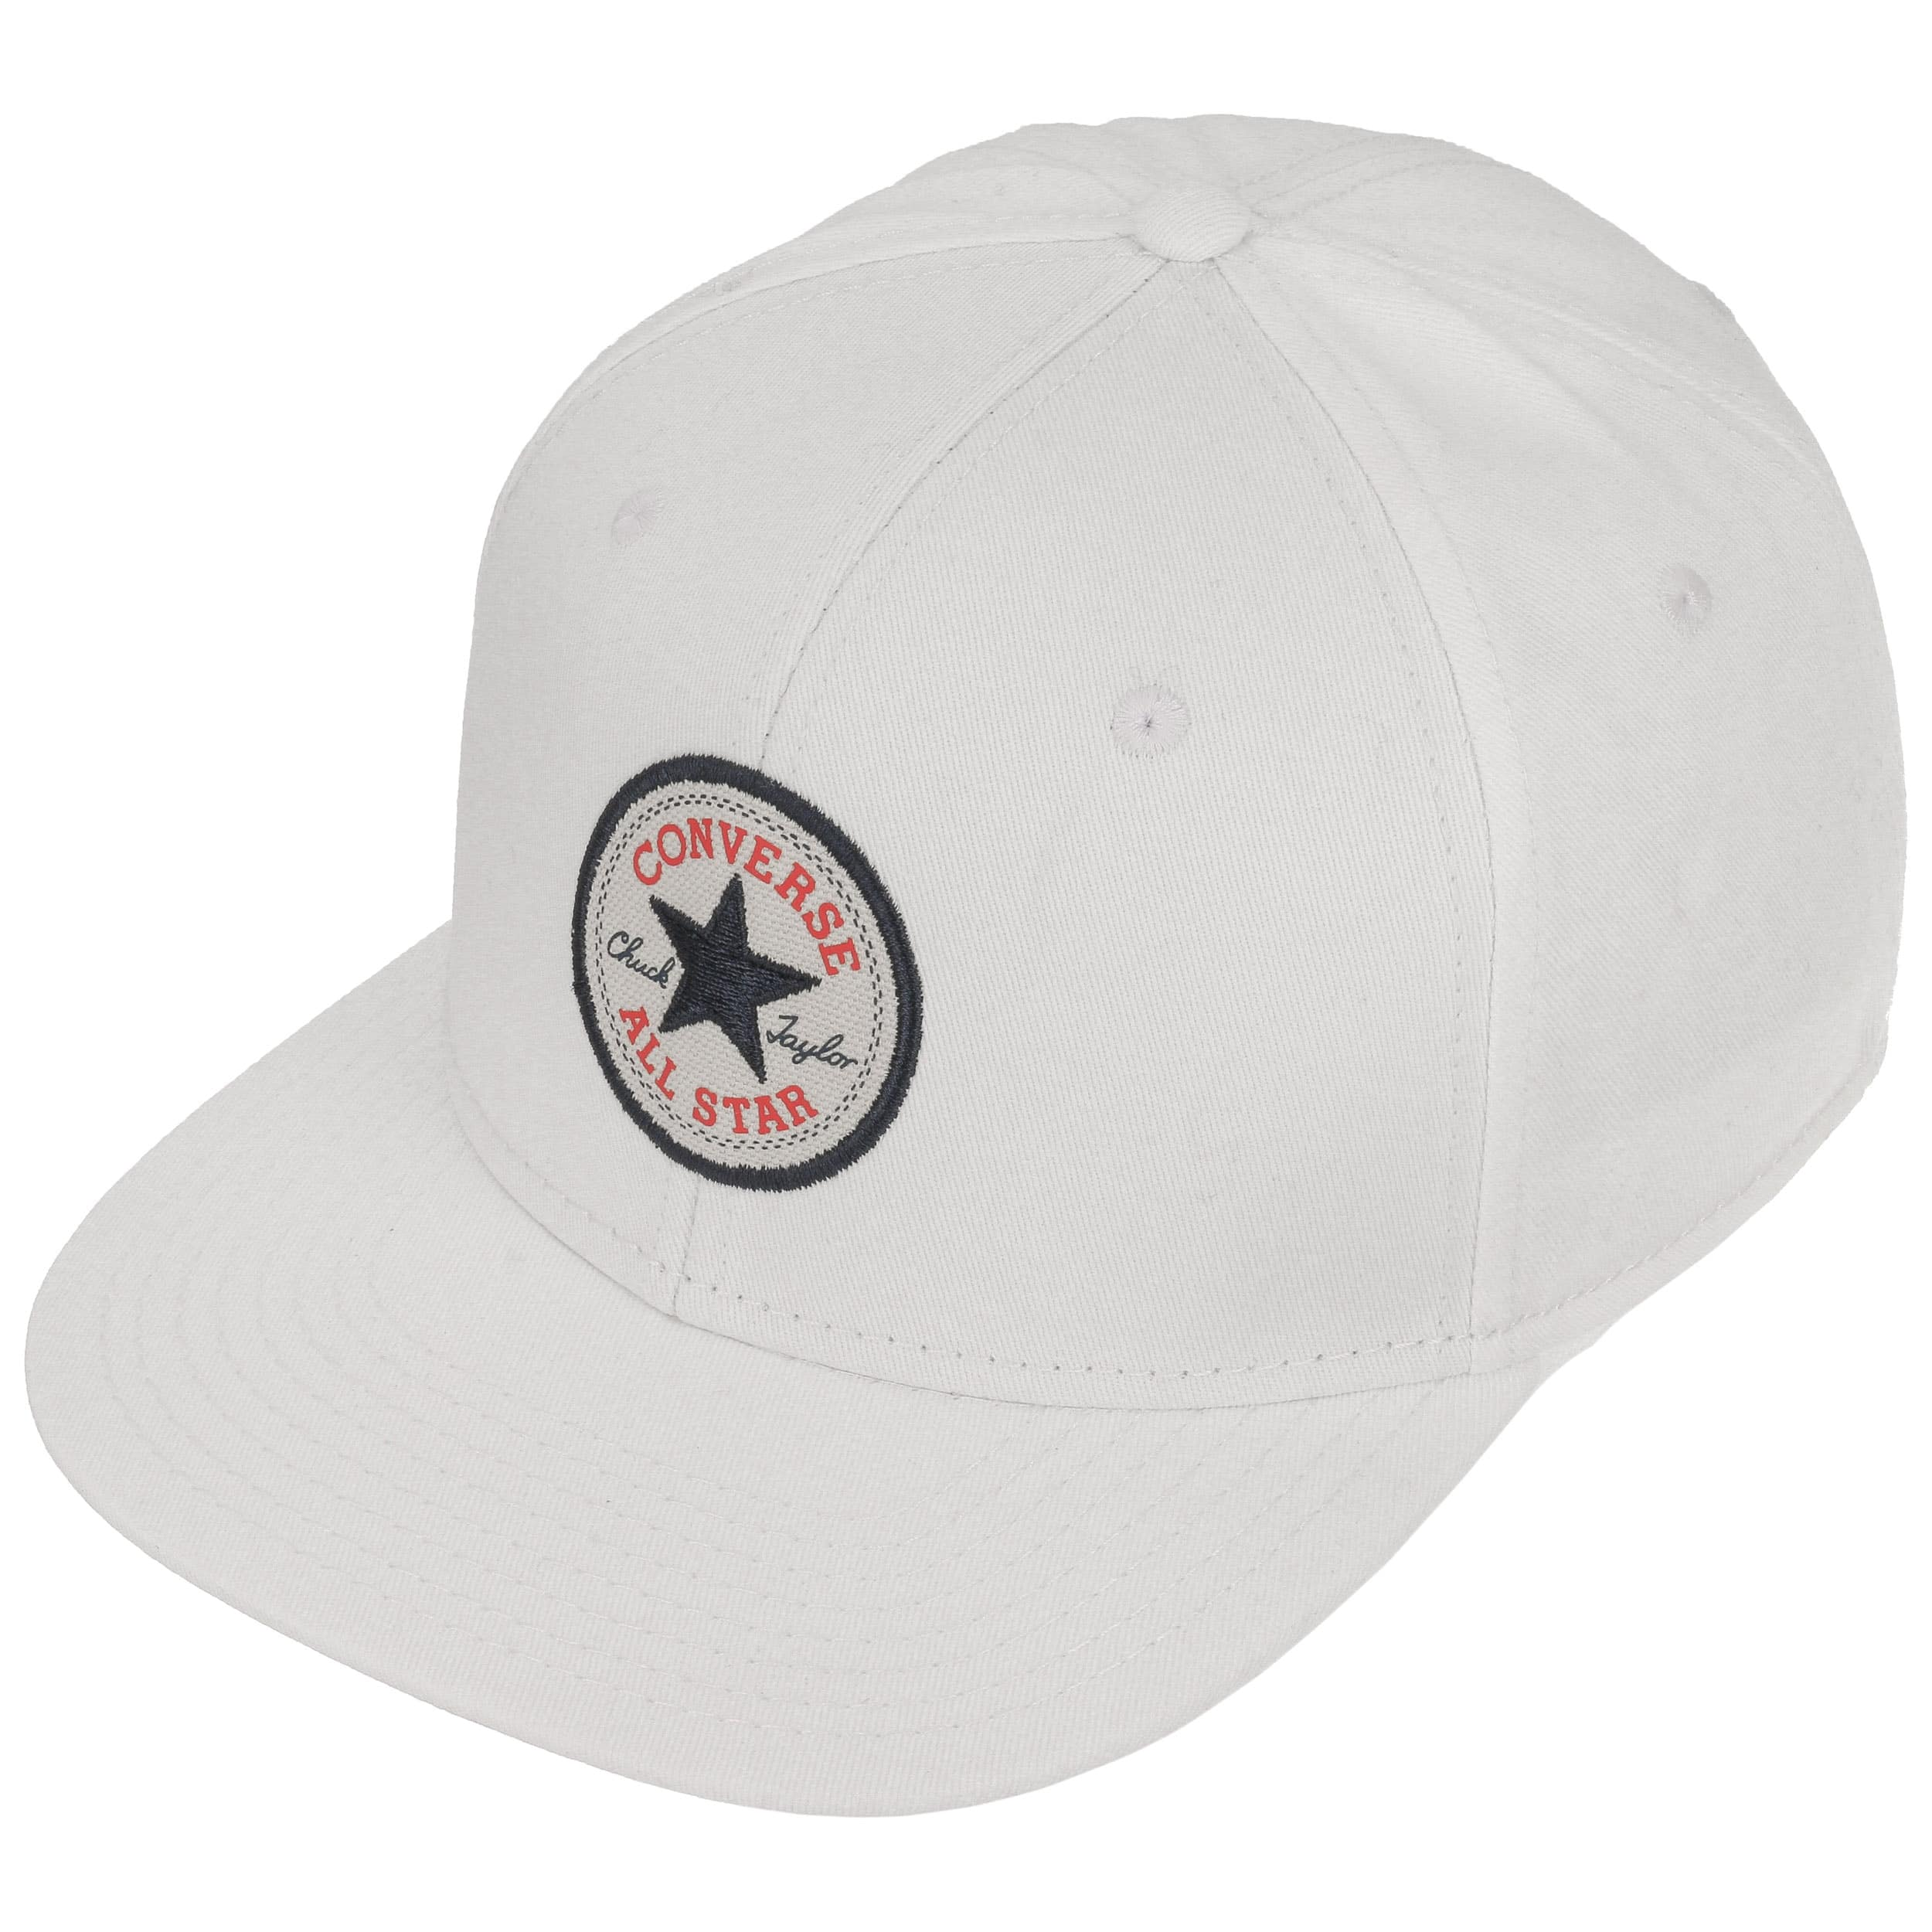 ... Core Twill Snapback Cap by Converse - white 1 ... ebc451ae832